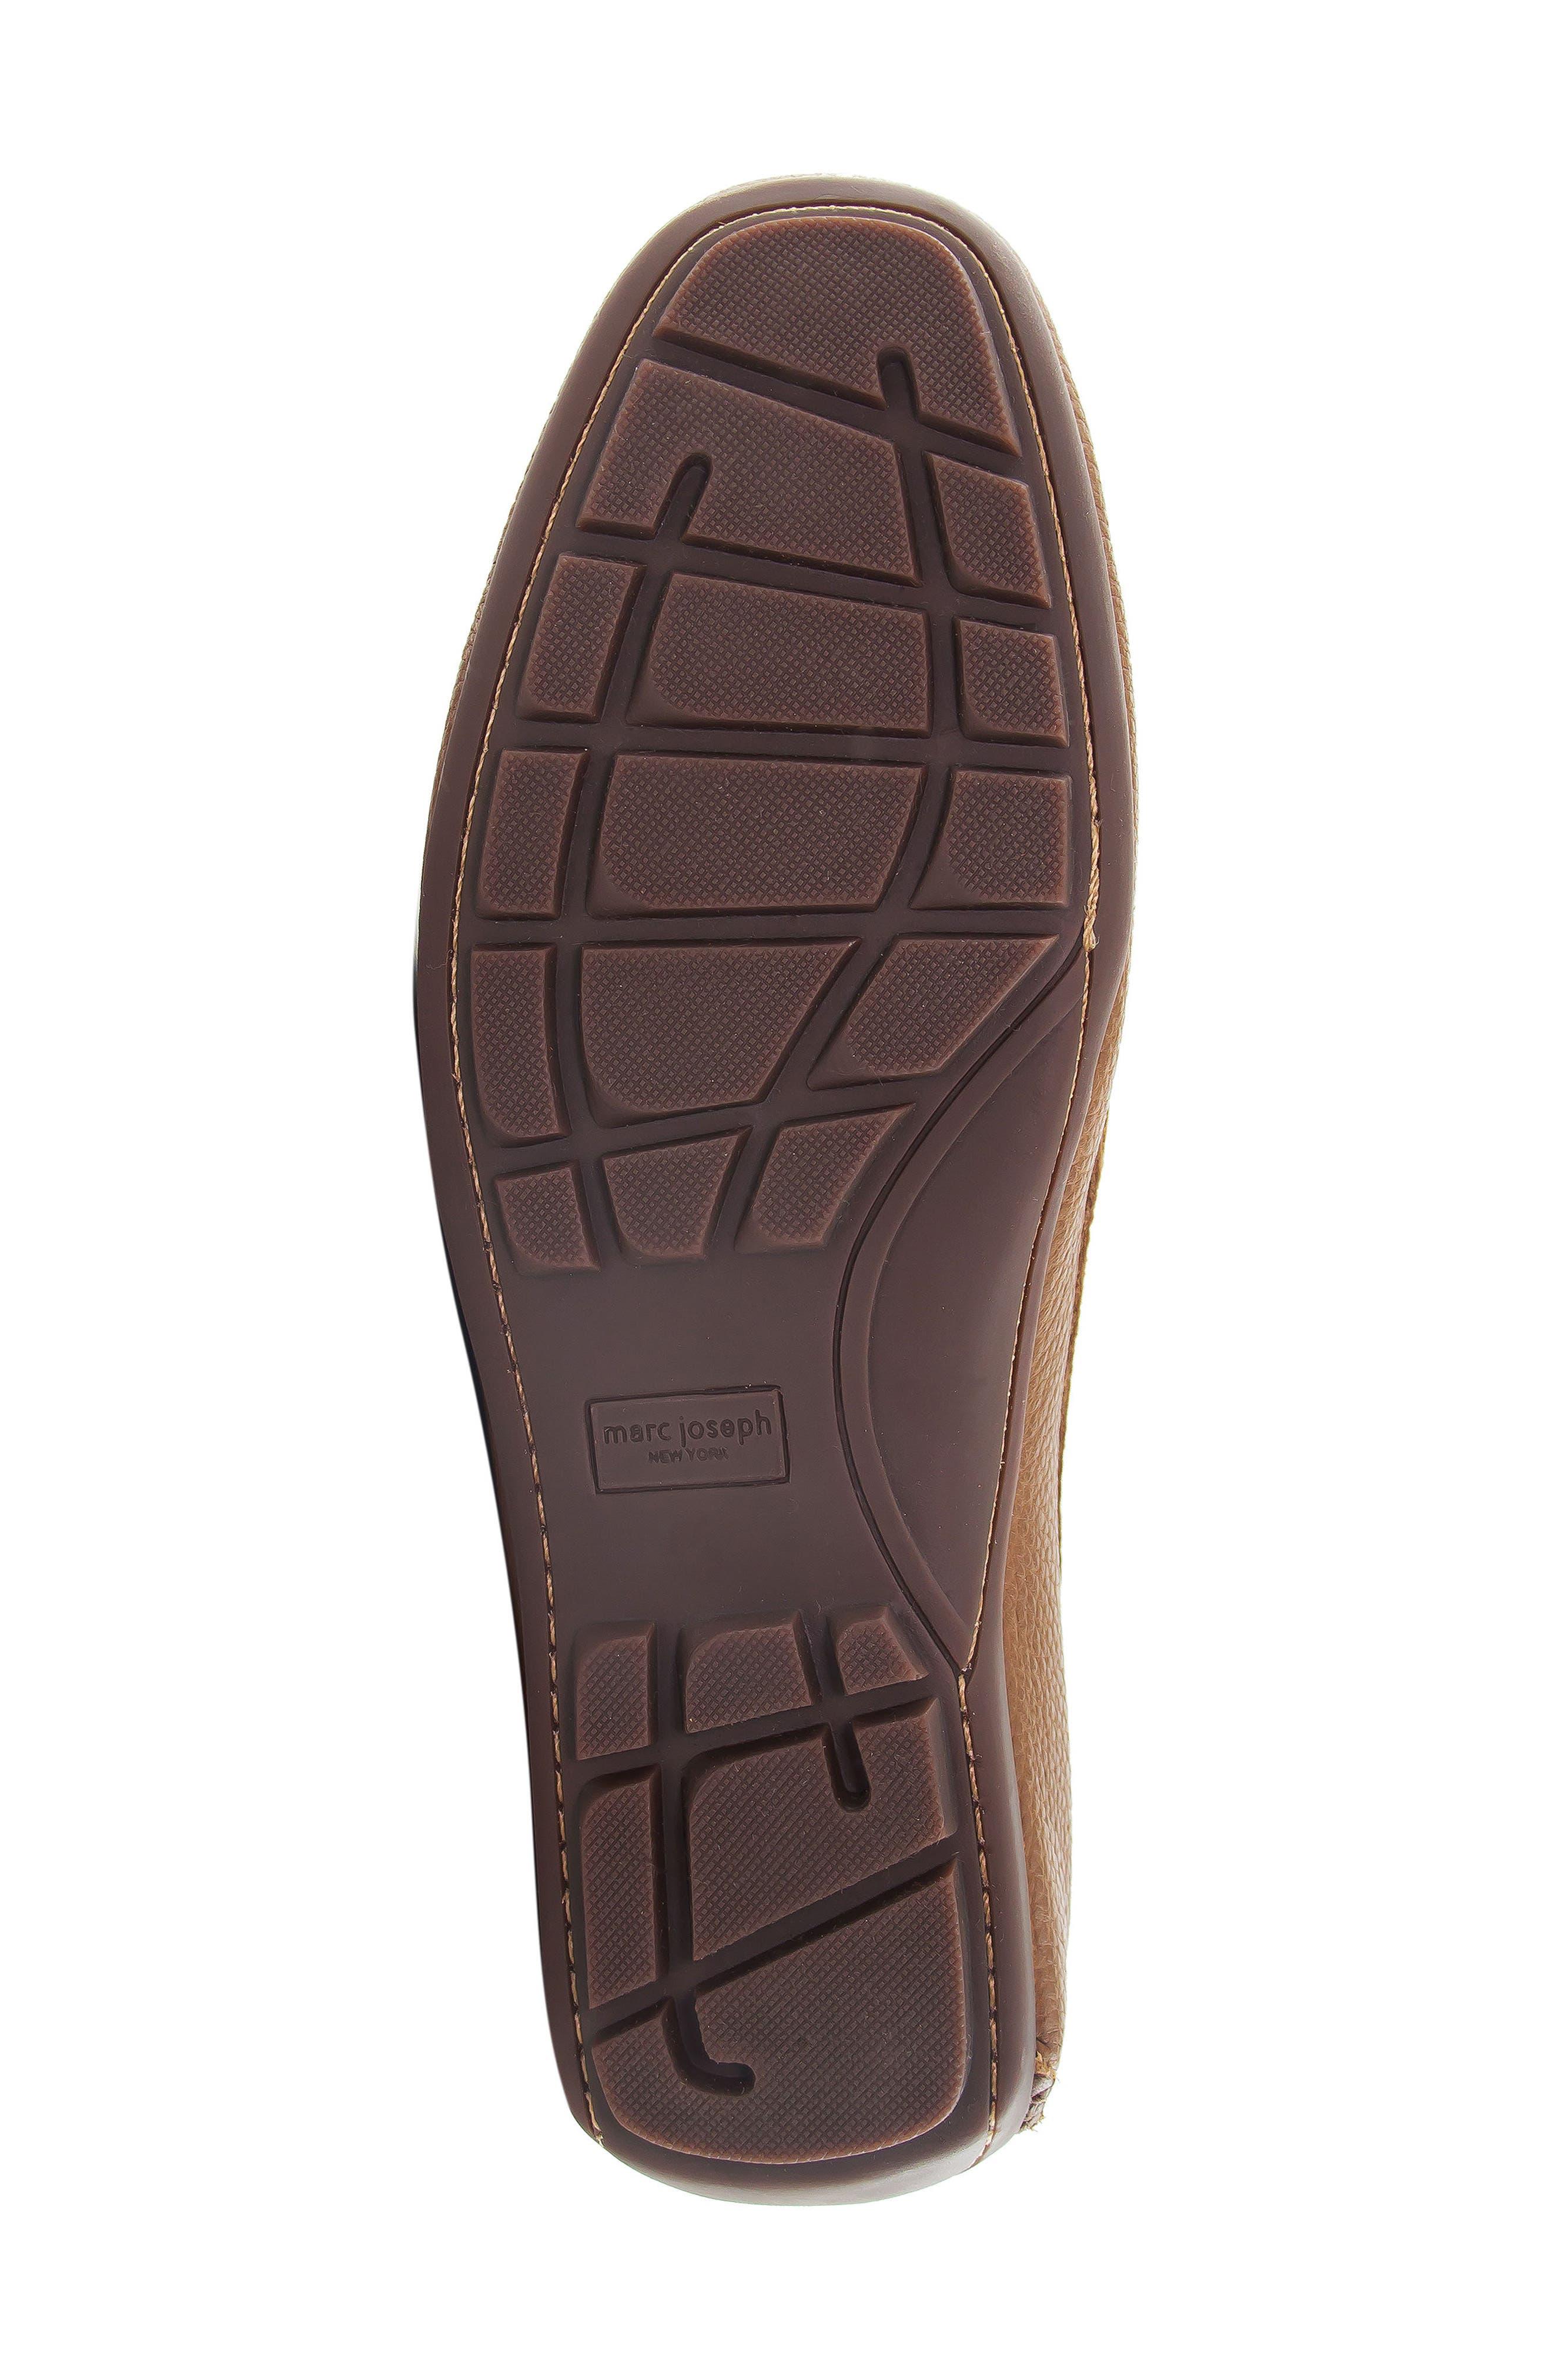 Bushwick Tasseled Driving Loafer,                             Alternate thumbnail 6, color,                             Cognac